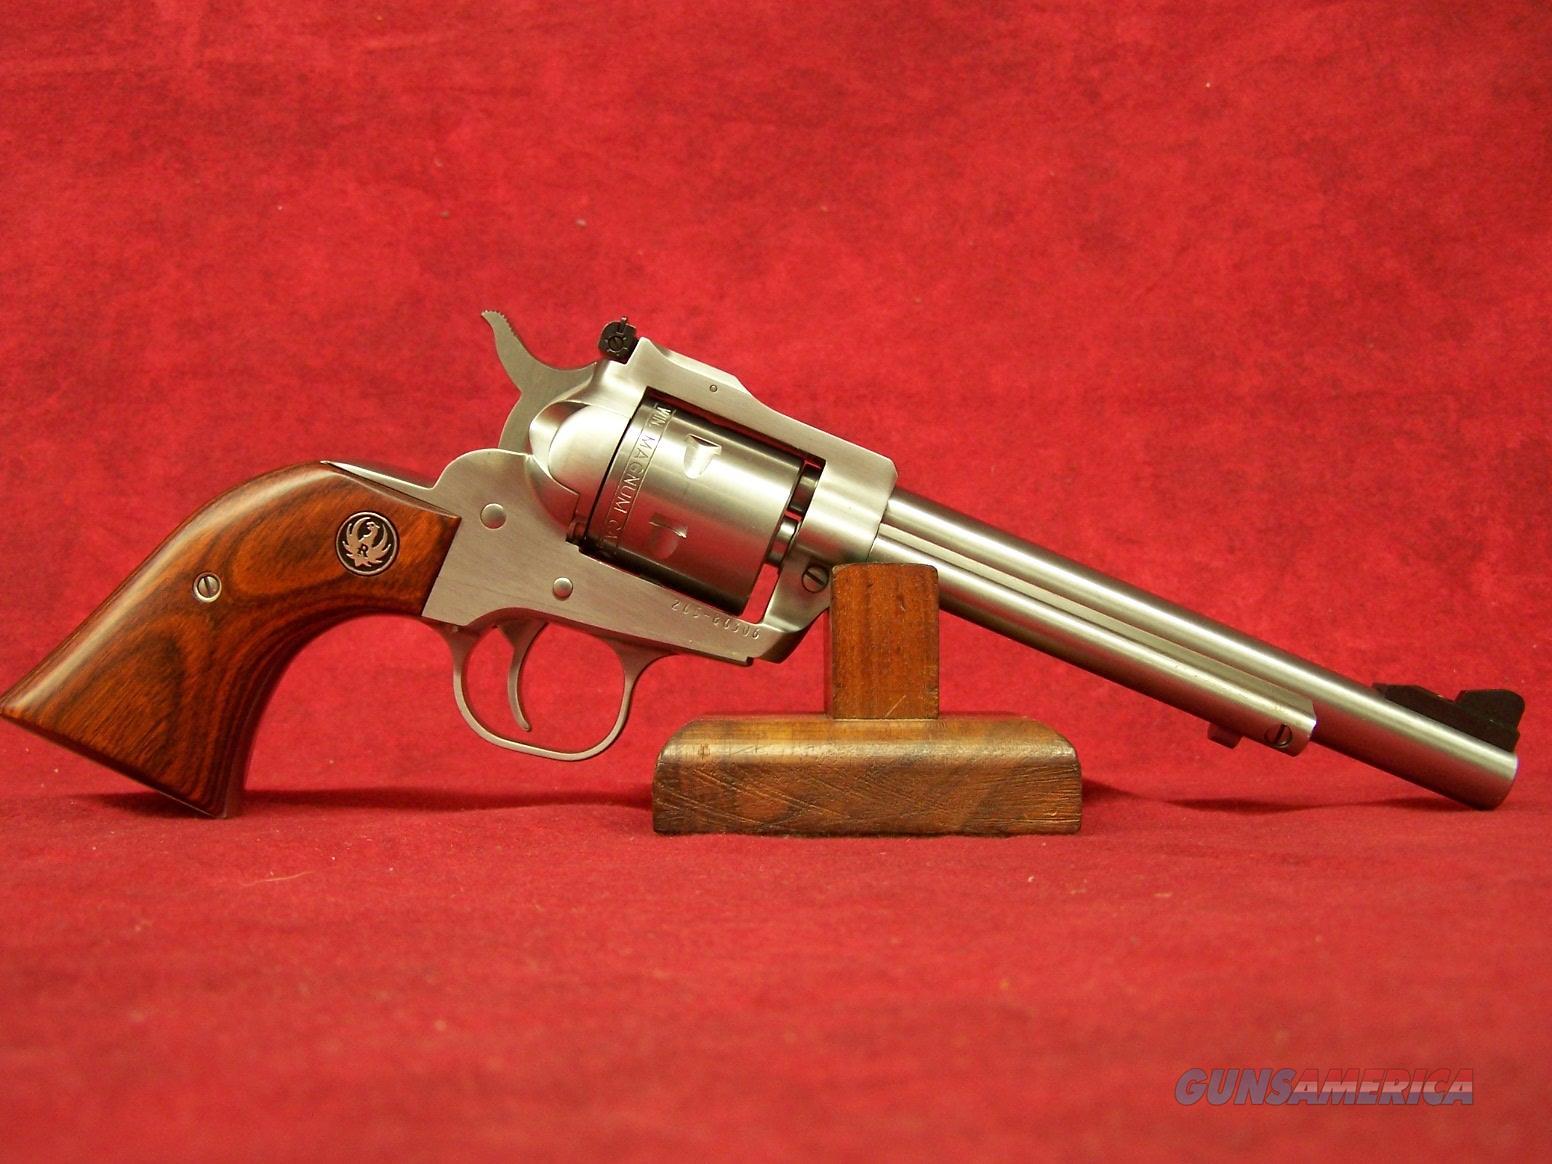 "Ruger Single Six Convertible .22LR/.22 Mag 6.5"" Barrel (0626)  Guns > Pistols > Ruger Single Action Revolvers > Single Six Type"